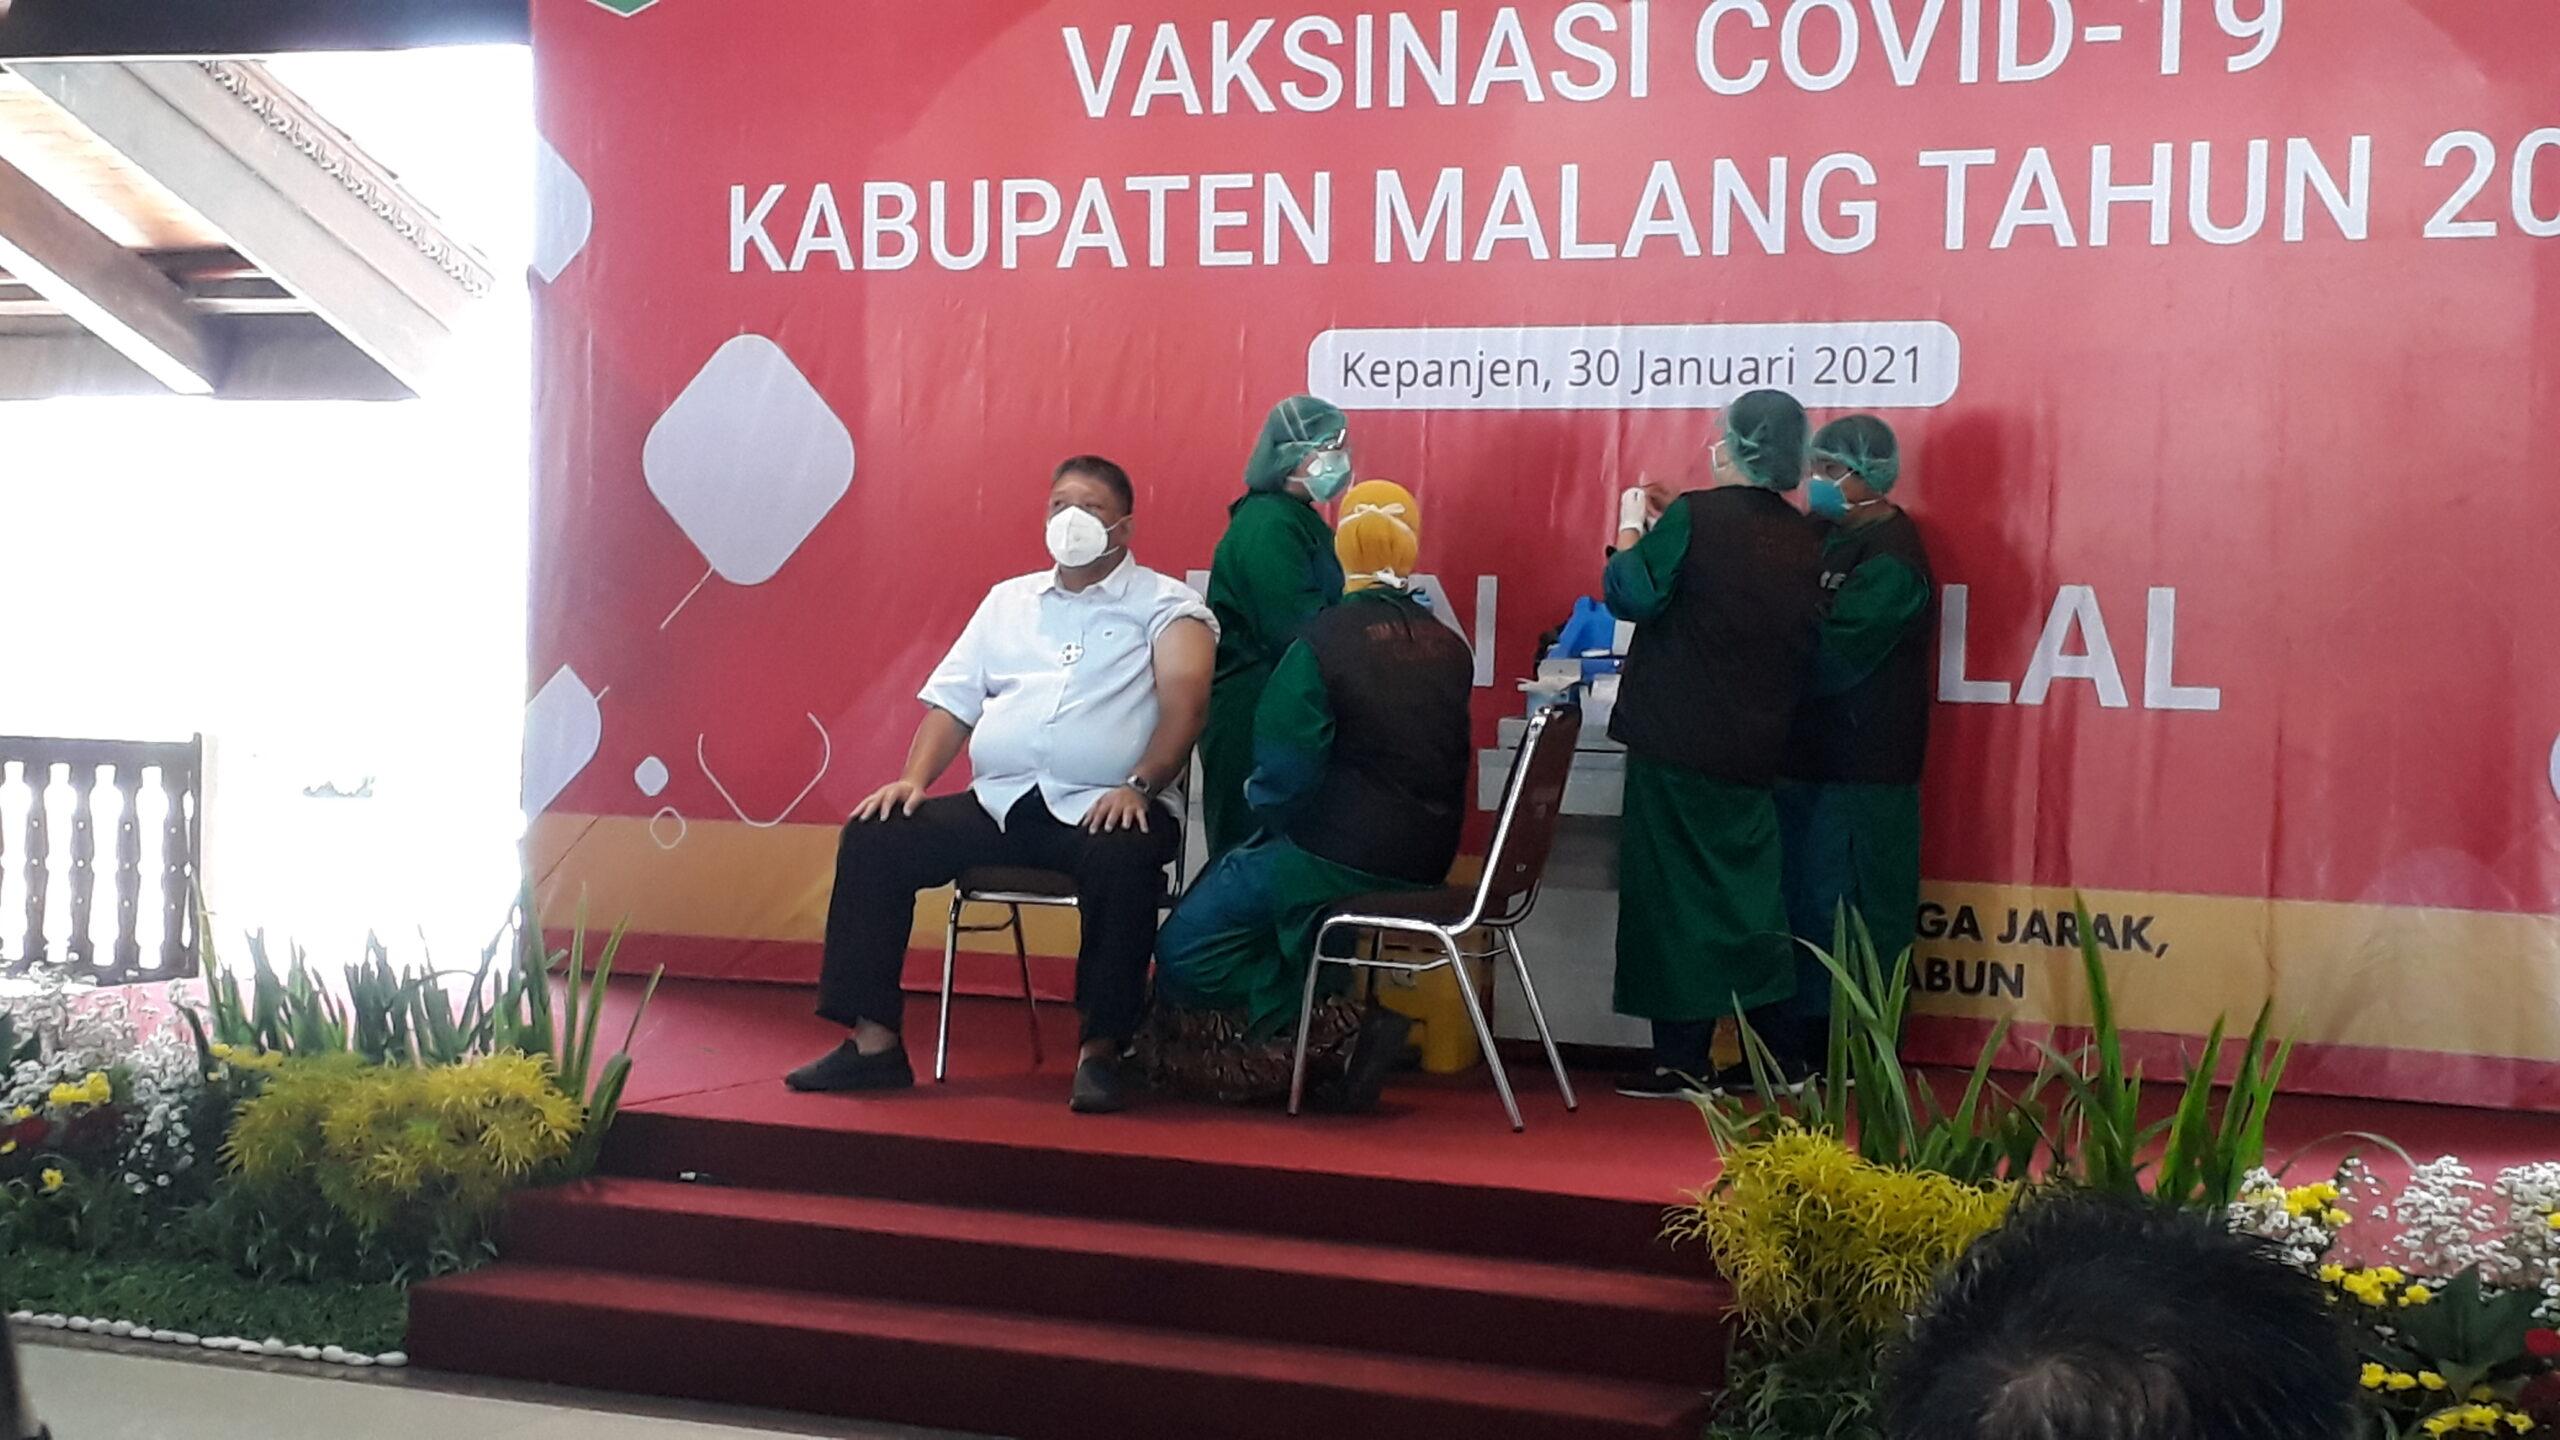 Tiga Tokoh Publik Kabupaten Malang Gagal Suntik Vaksin